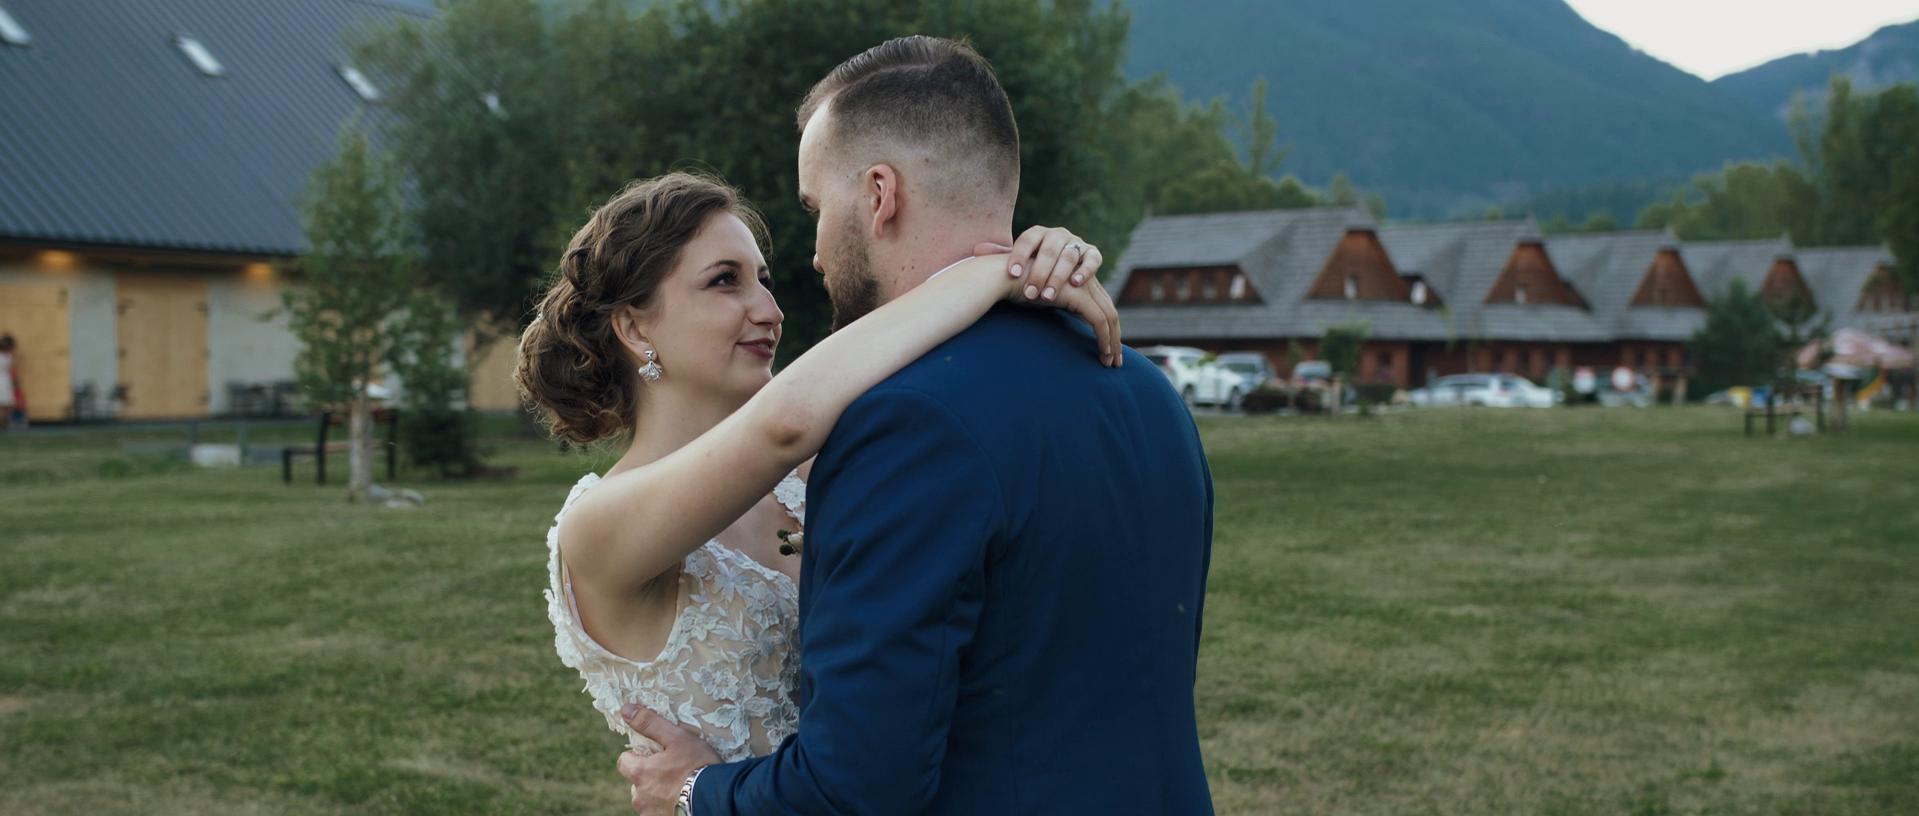 Kristína & Jakub